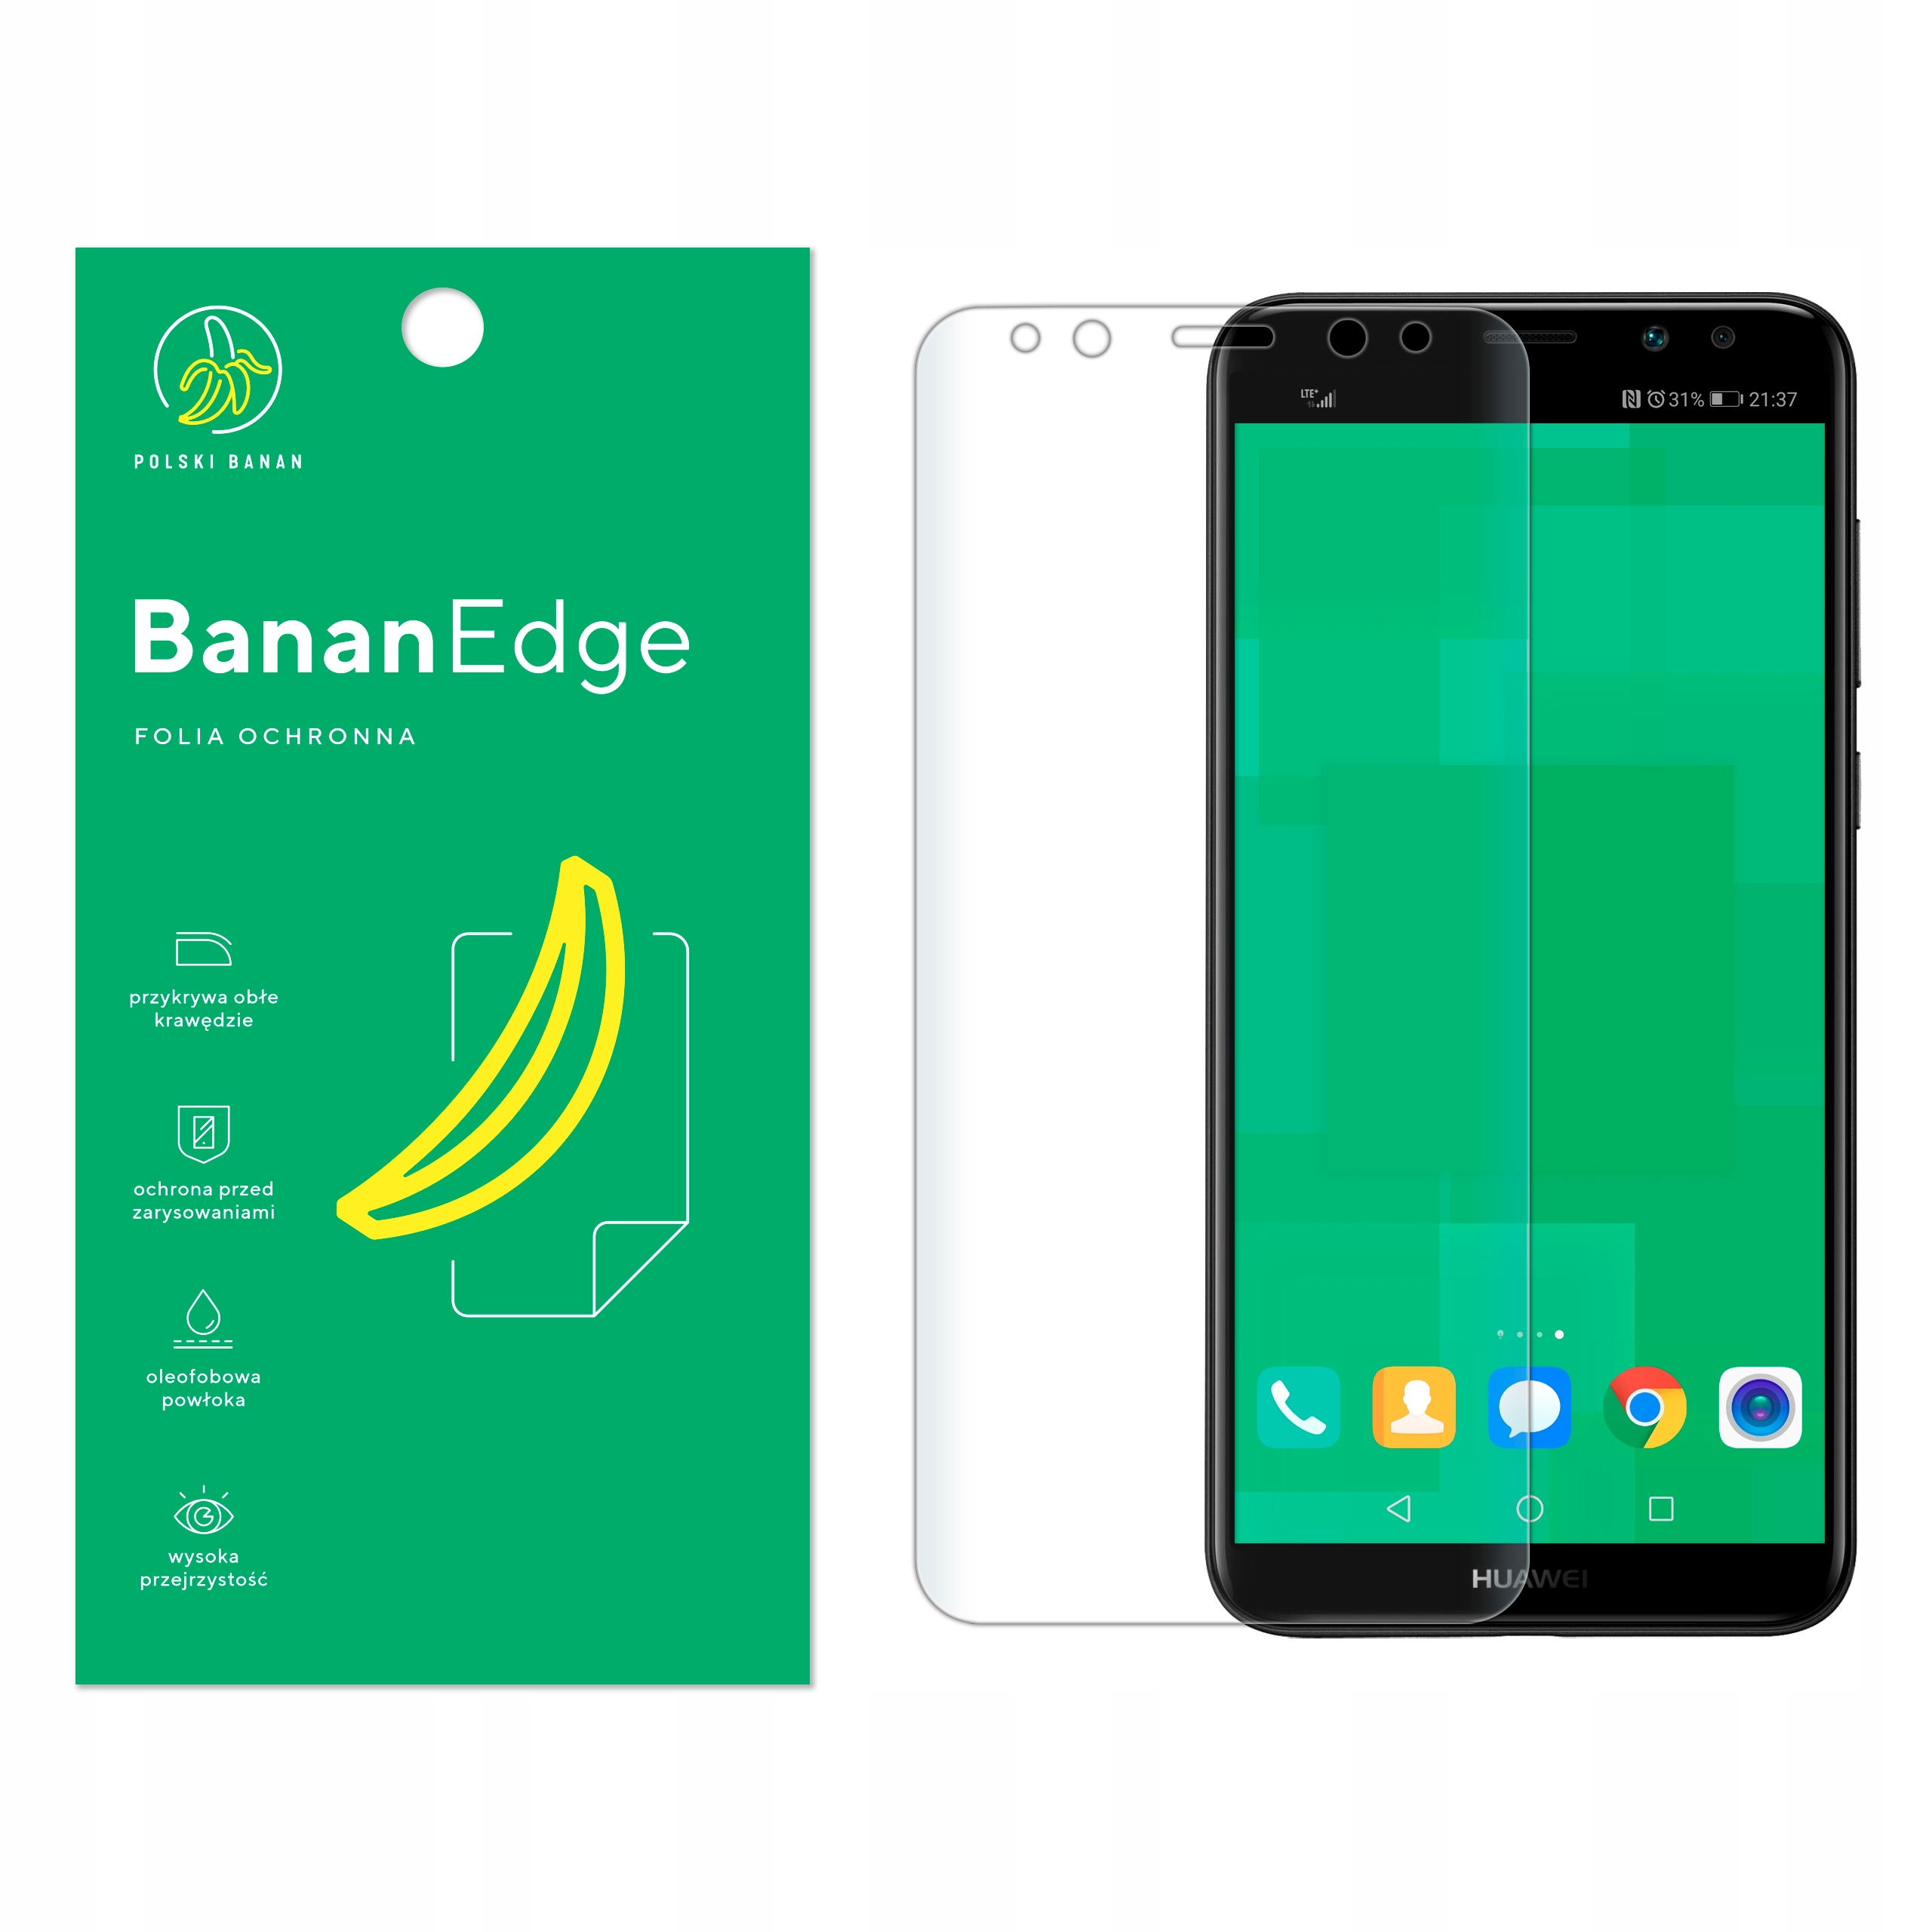 Folia Ochronna Polski Banan do Huawei Mate 10 Lite